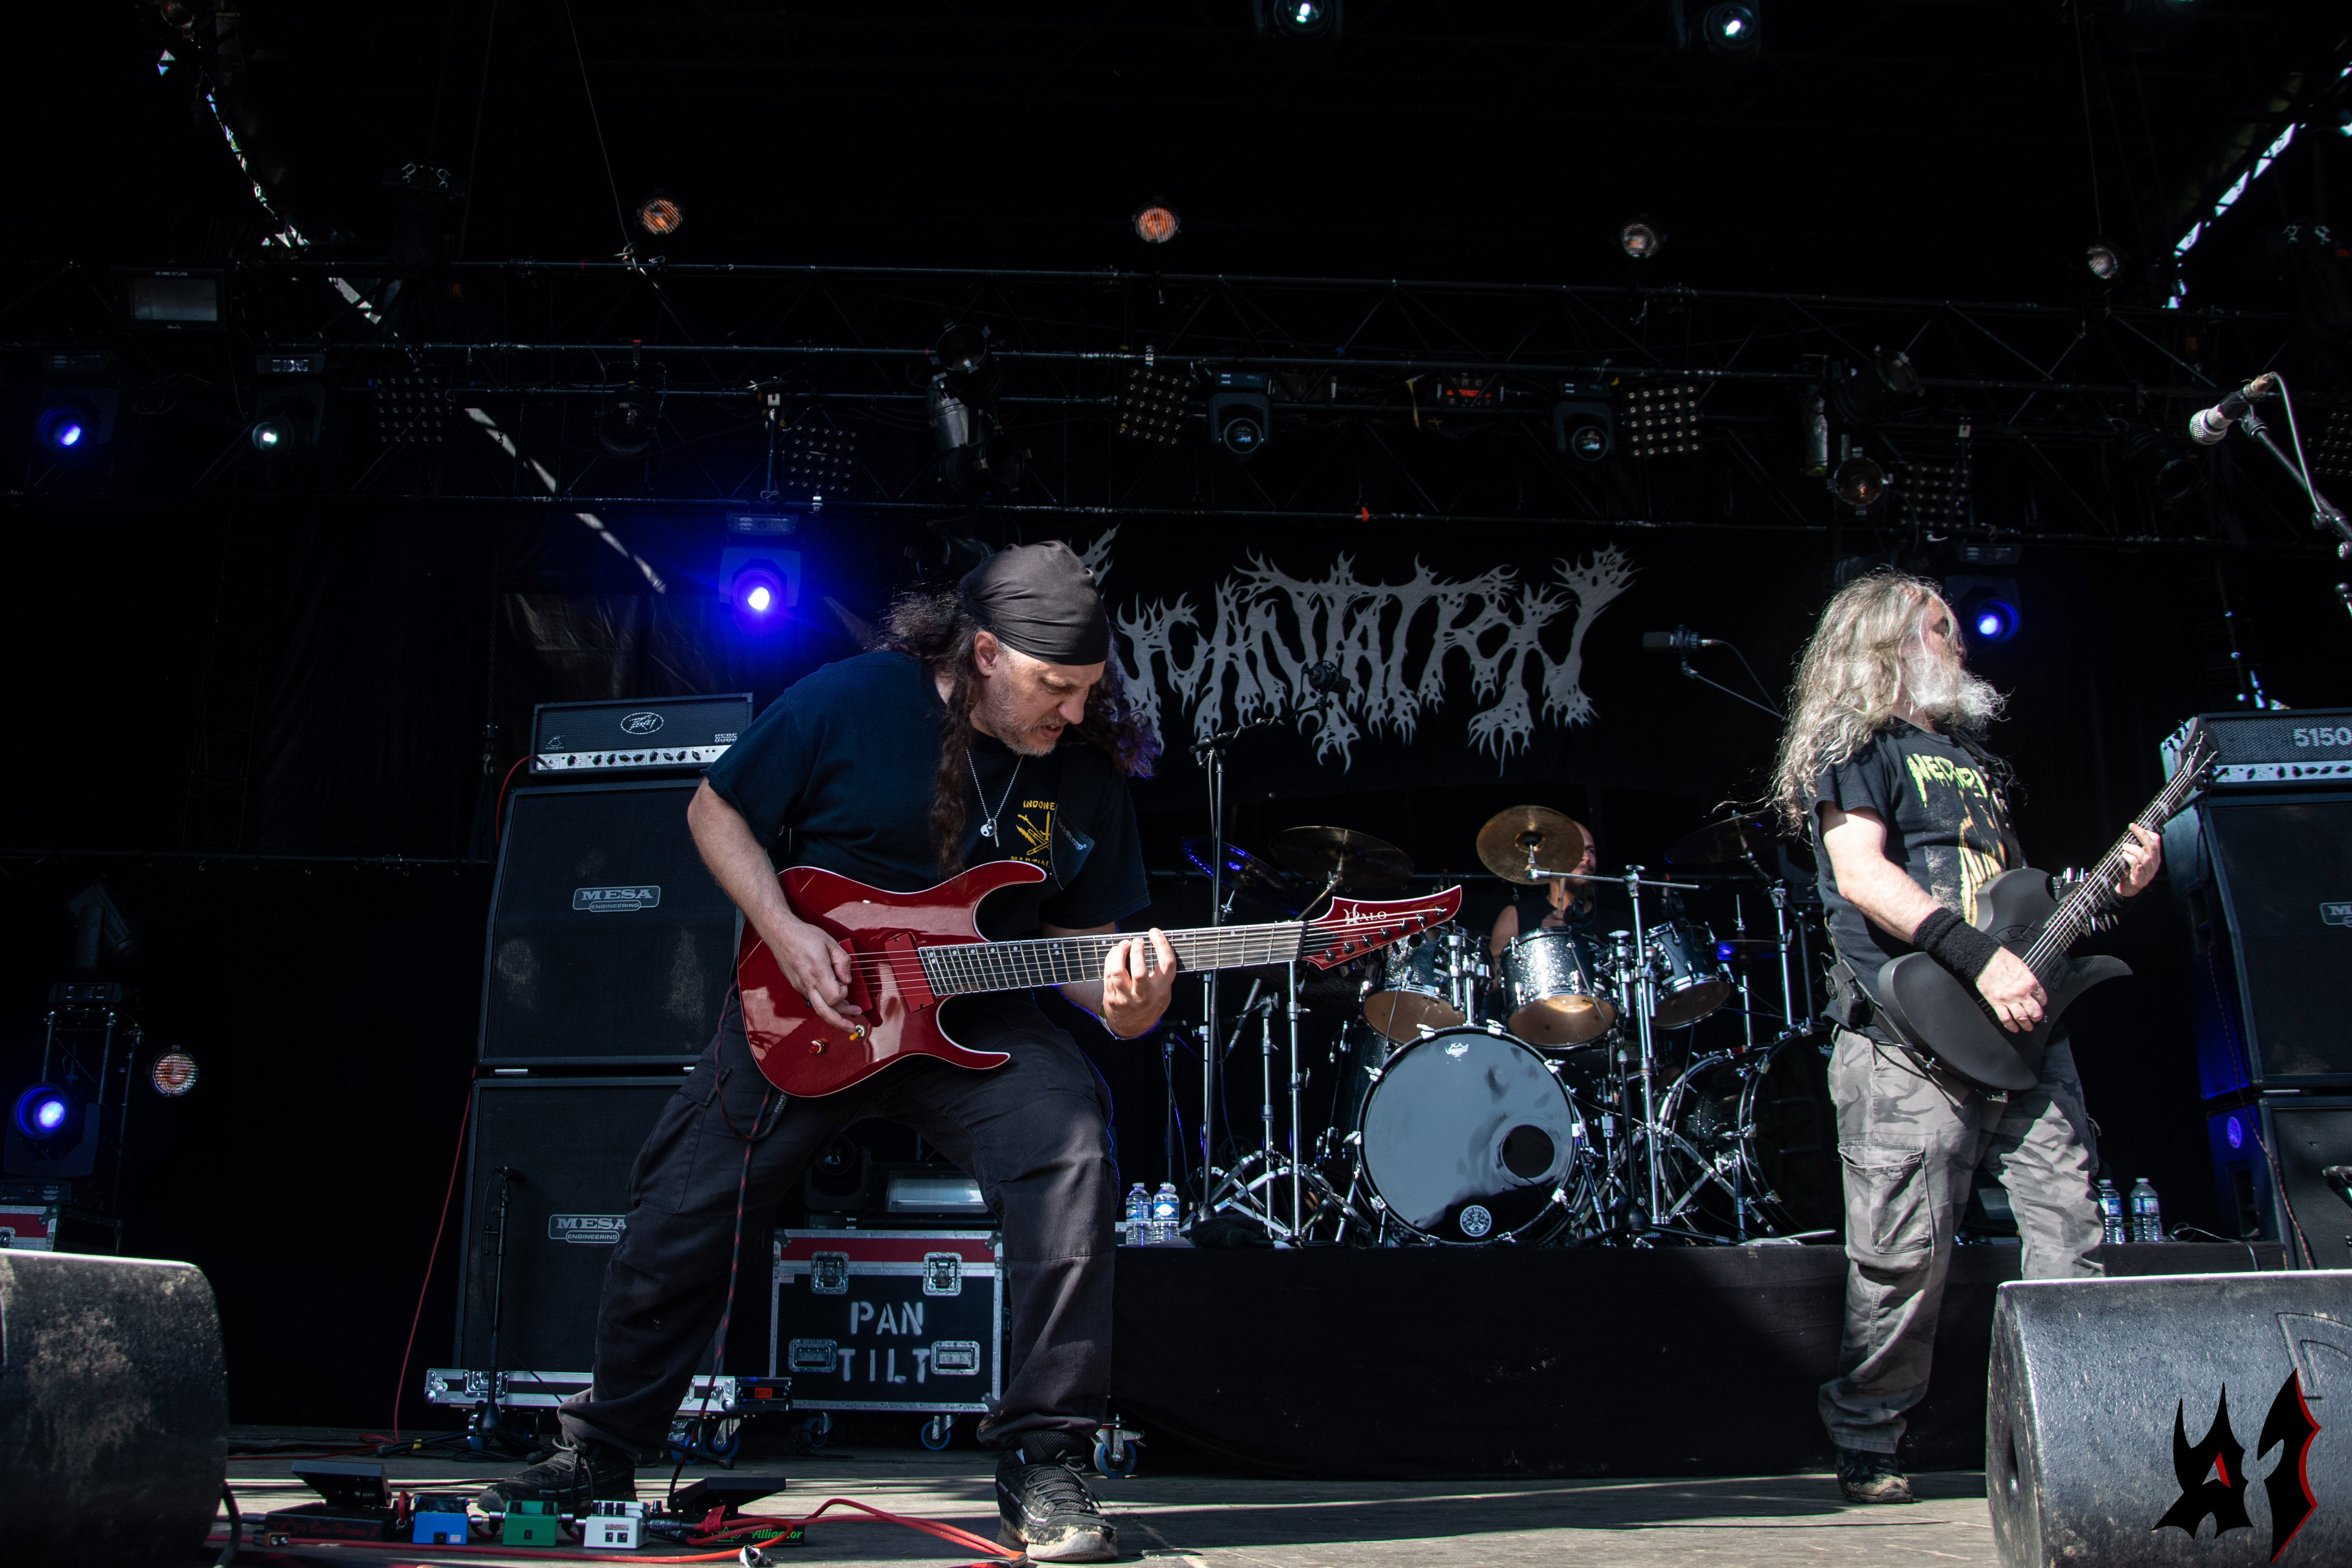 Motocultor - Incantation - 8